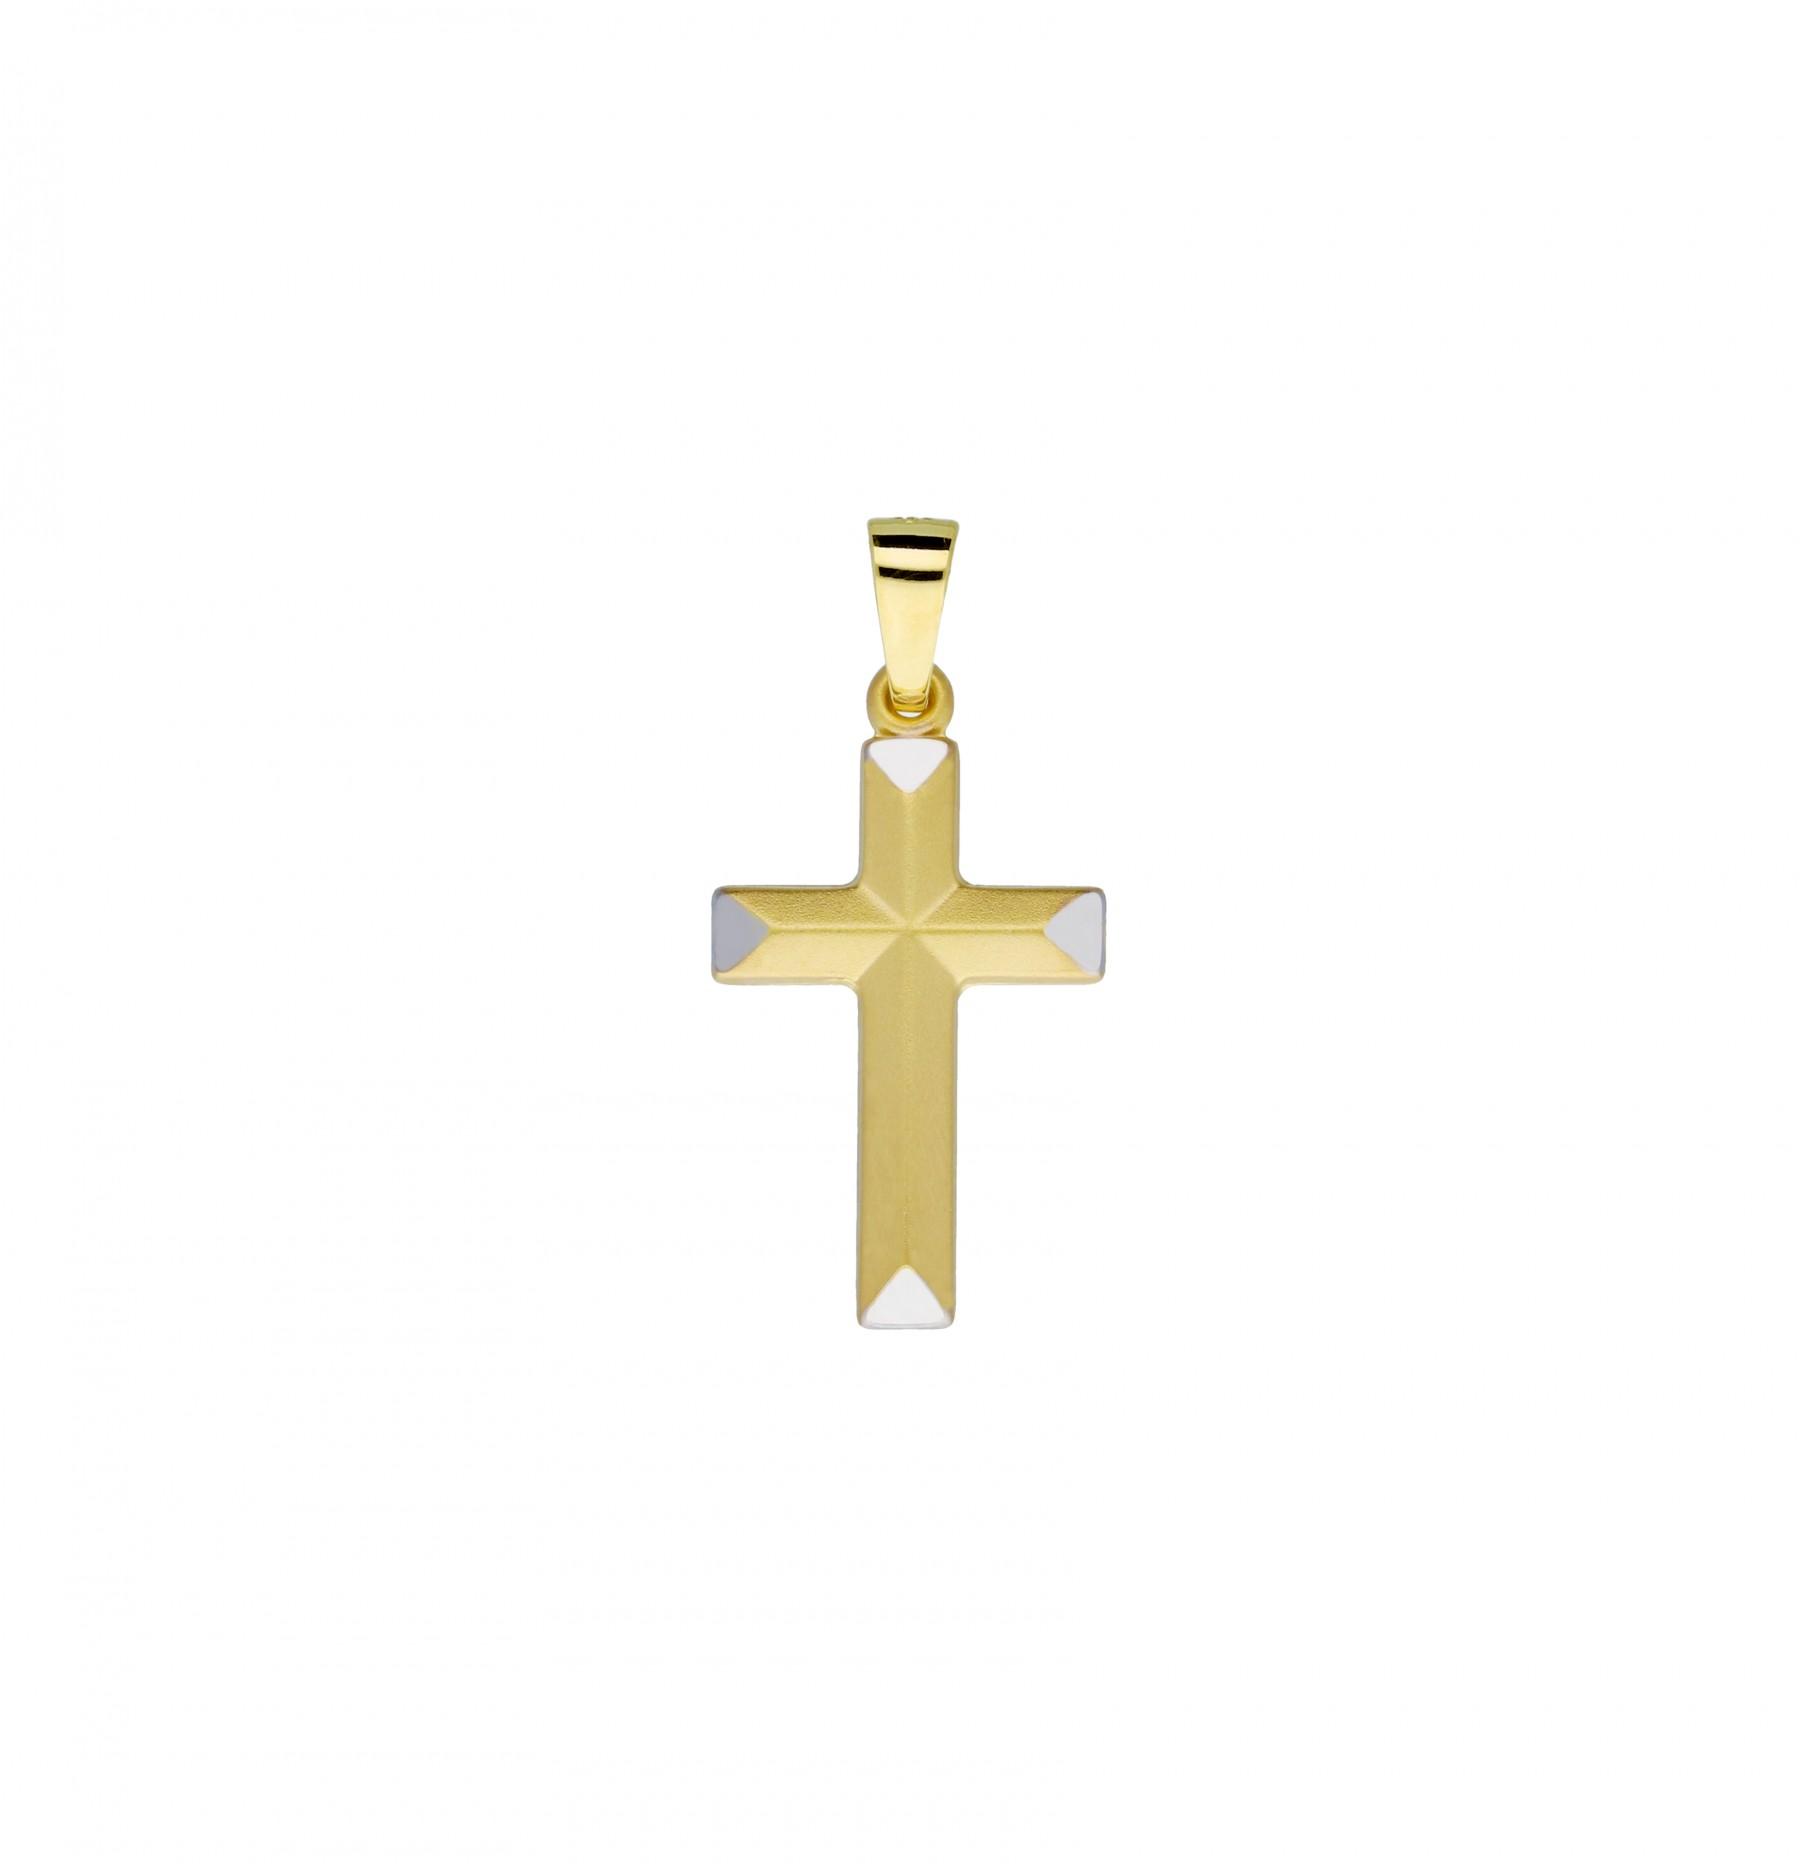 Religious Gouden Kruisje - 21 X 12 Mm Bicolor Mat Glanzend 246.0144.00